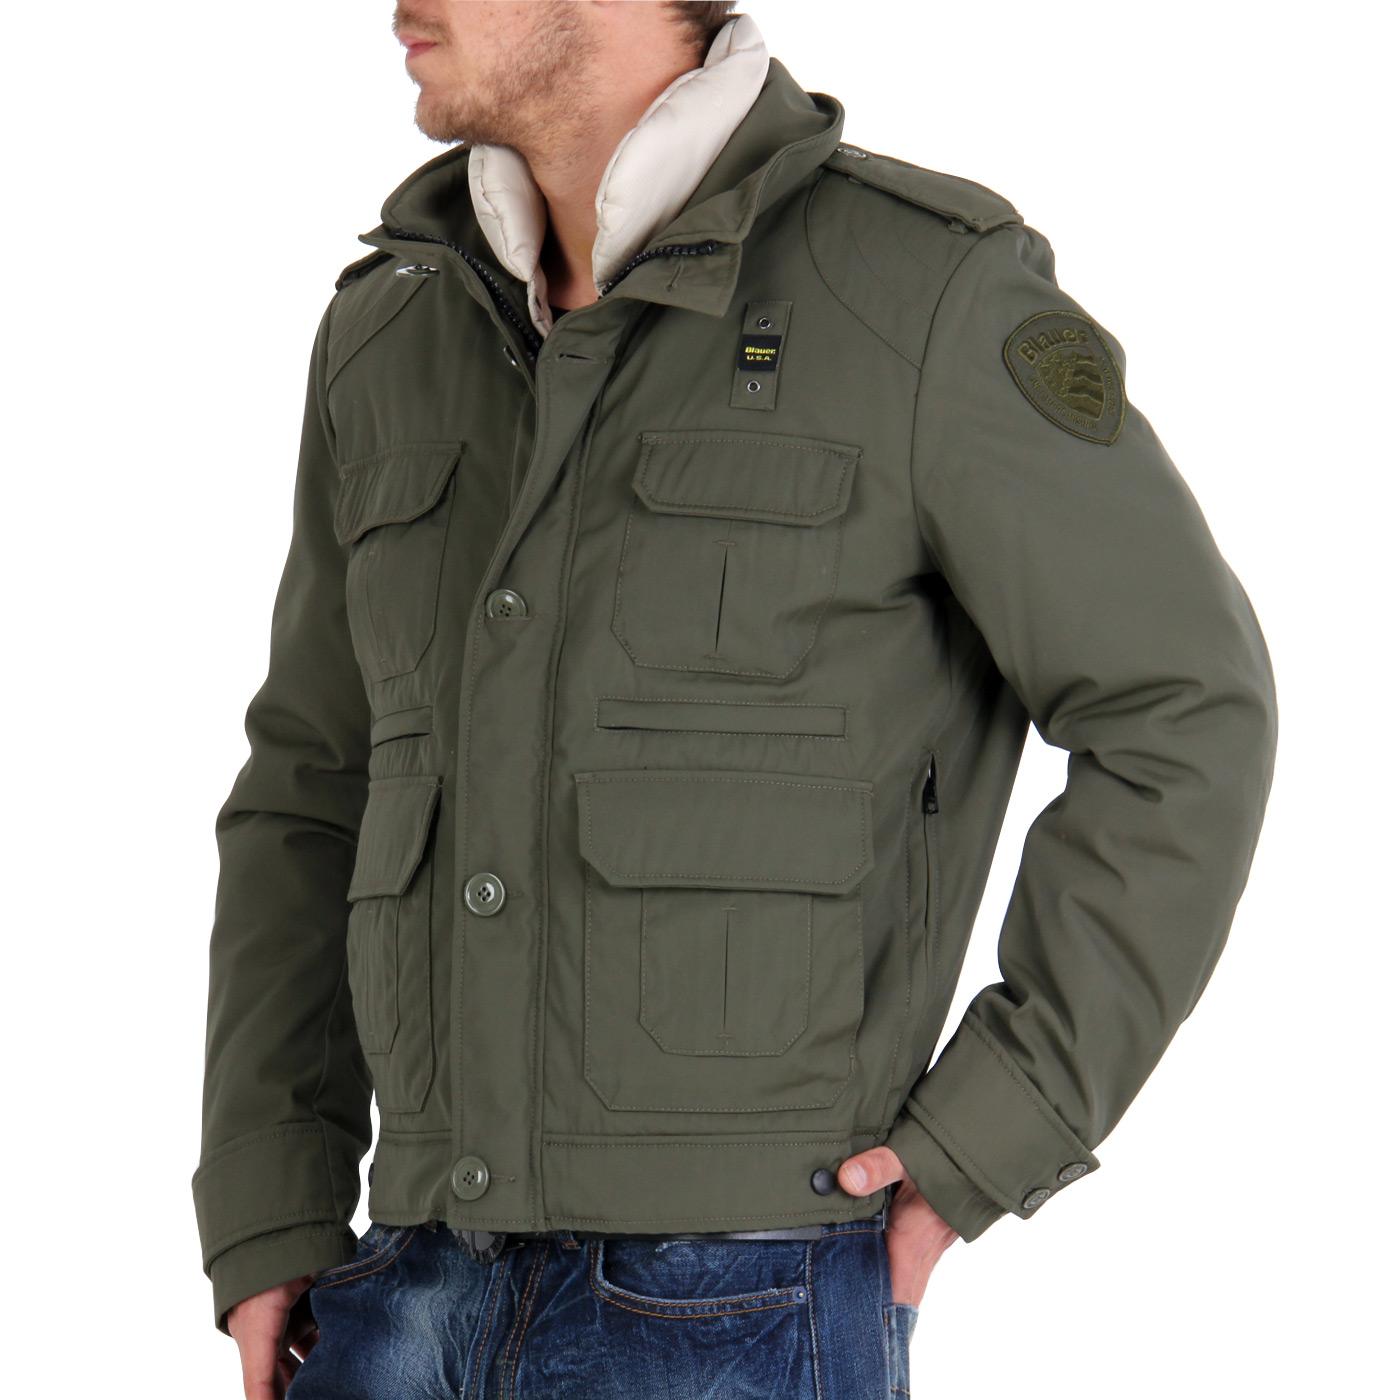 blauer usa herren winter jacke 2 in 1 field jacket green blu0557 ebay. Black Bedroom Furniture Sets. Home Design Ideas